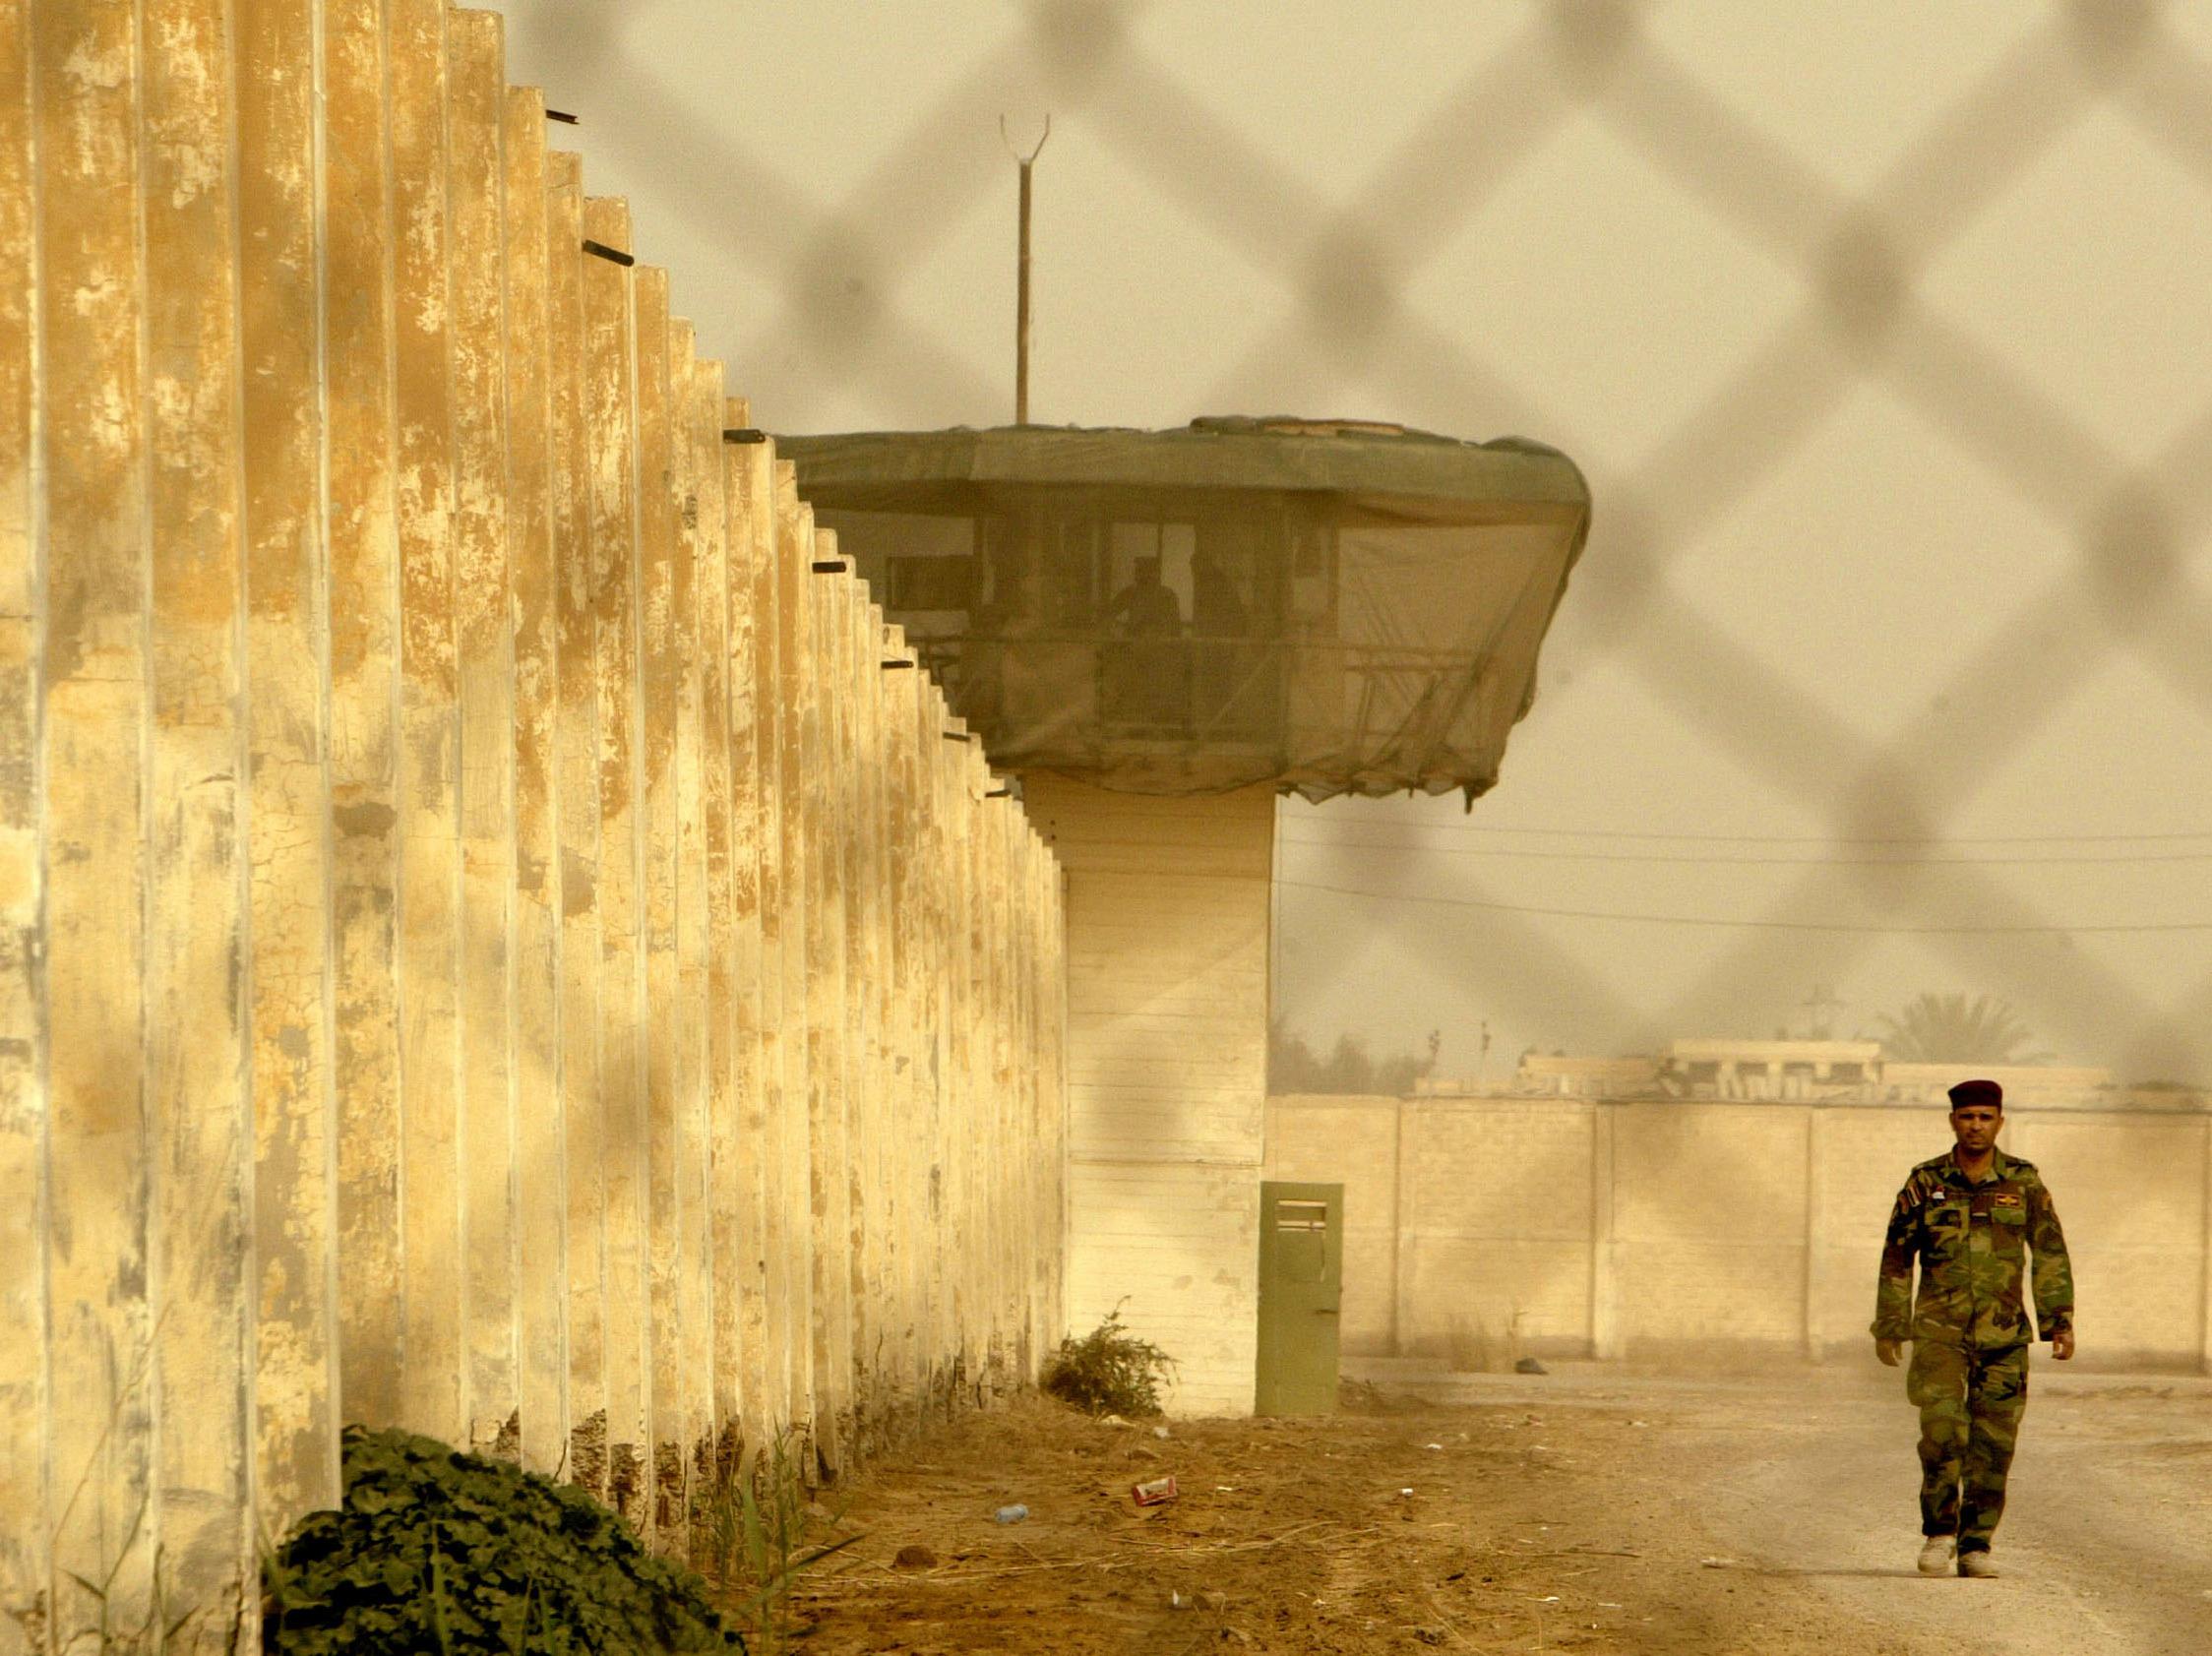 Iraq's Infamous Abu Ghraib Prison Temporarily Closed